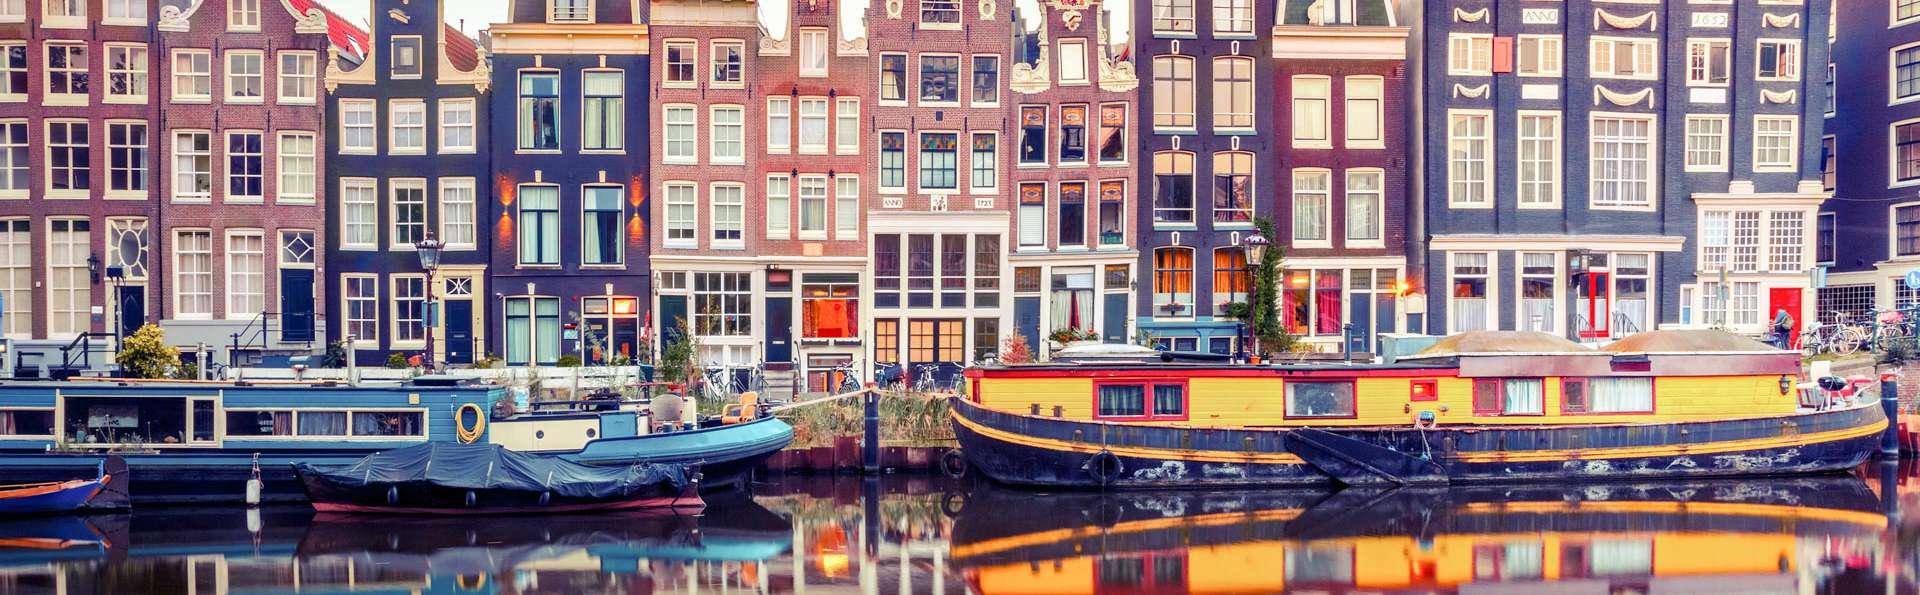 INK Hotel Amsterdam - MGallery Collection - EDIT_AMSTERDAM_55.jpg